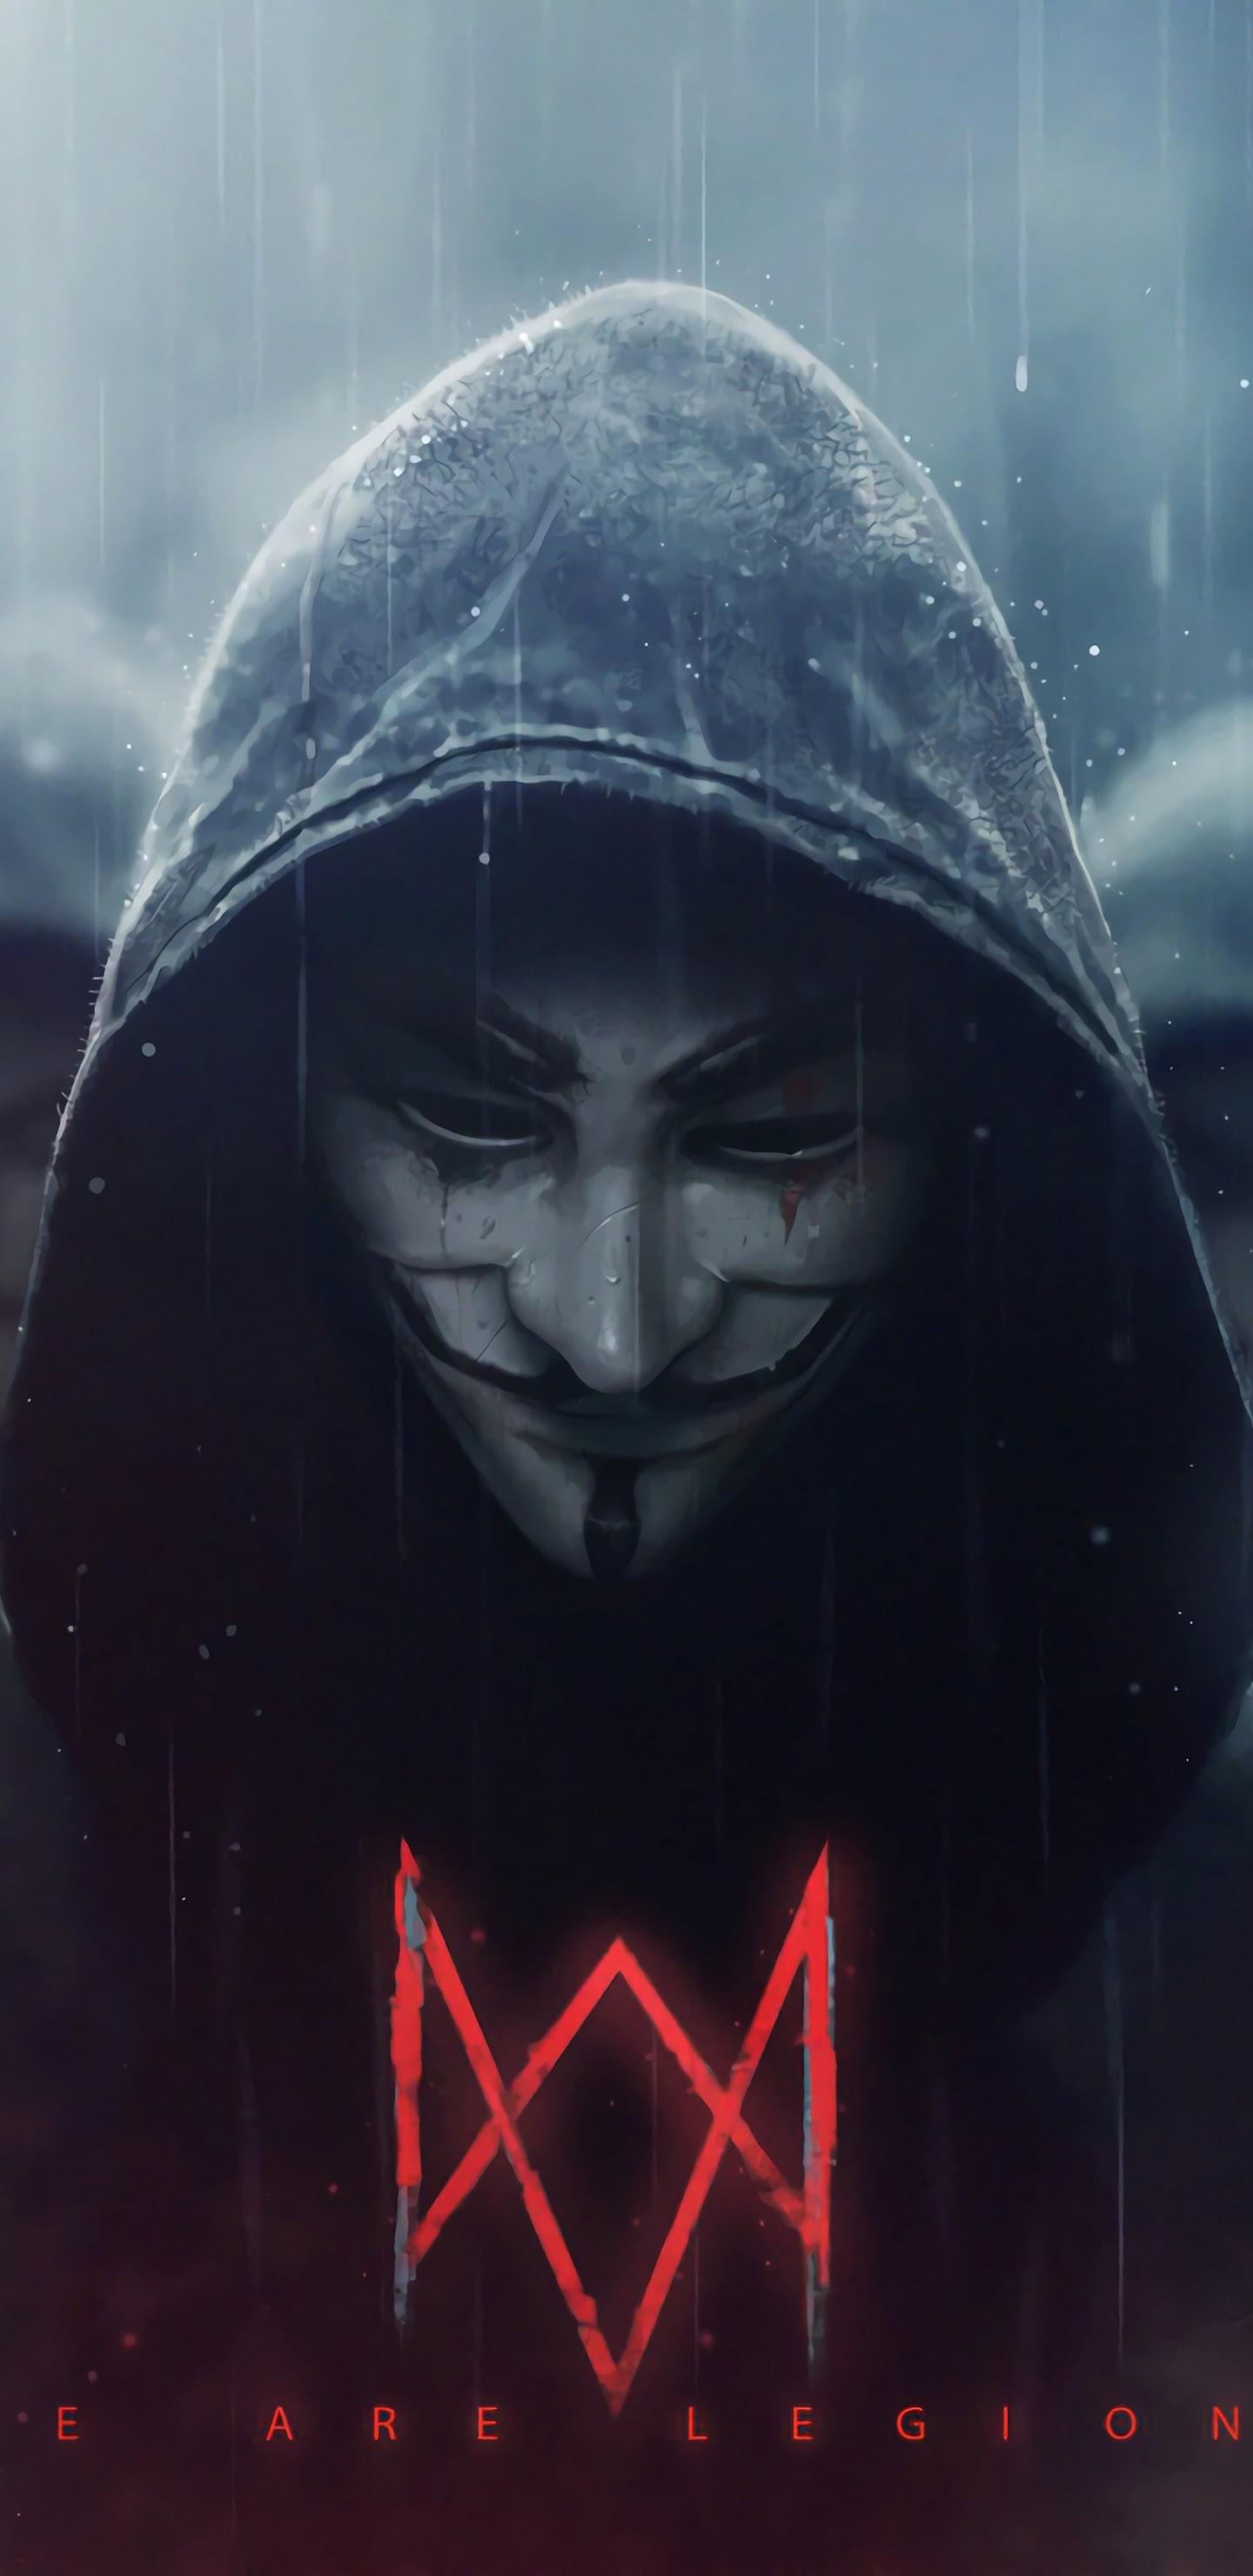 watch dogs legion logo anonymous uhdpaper.com 4K 3